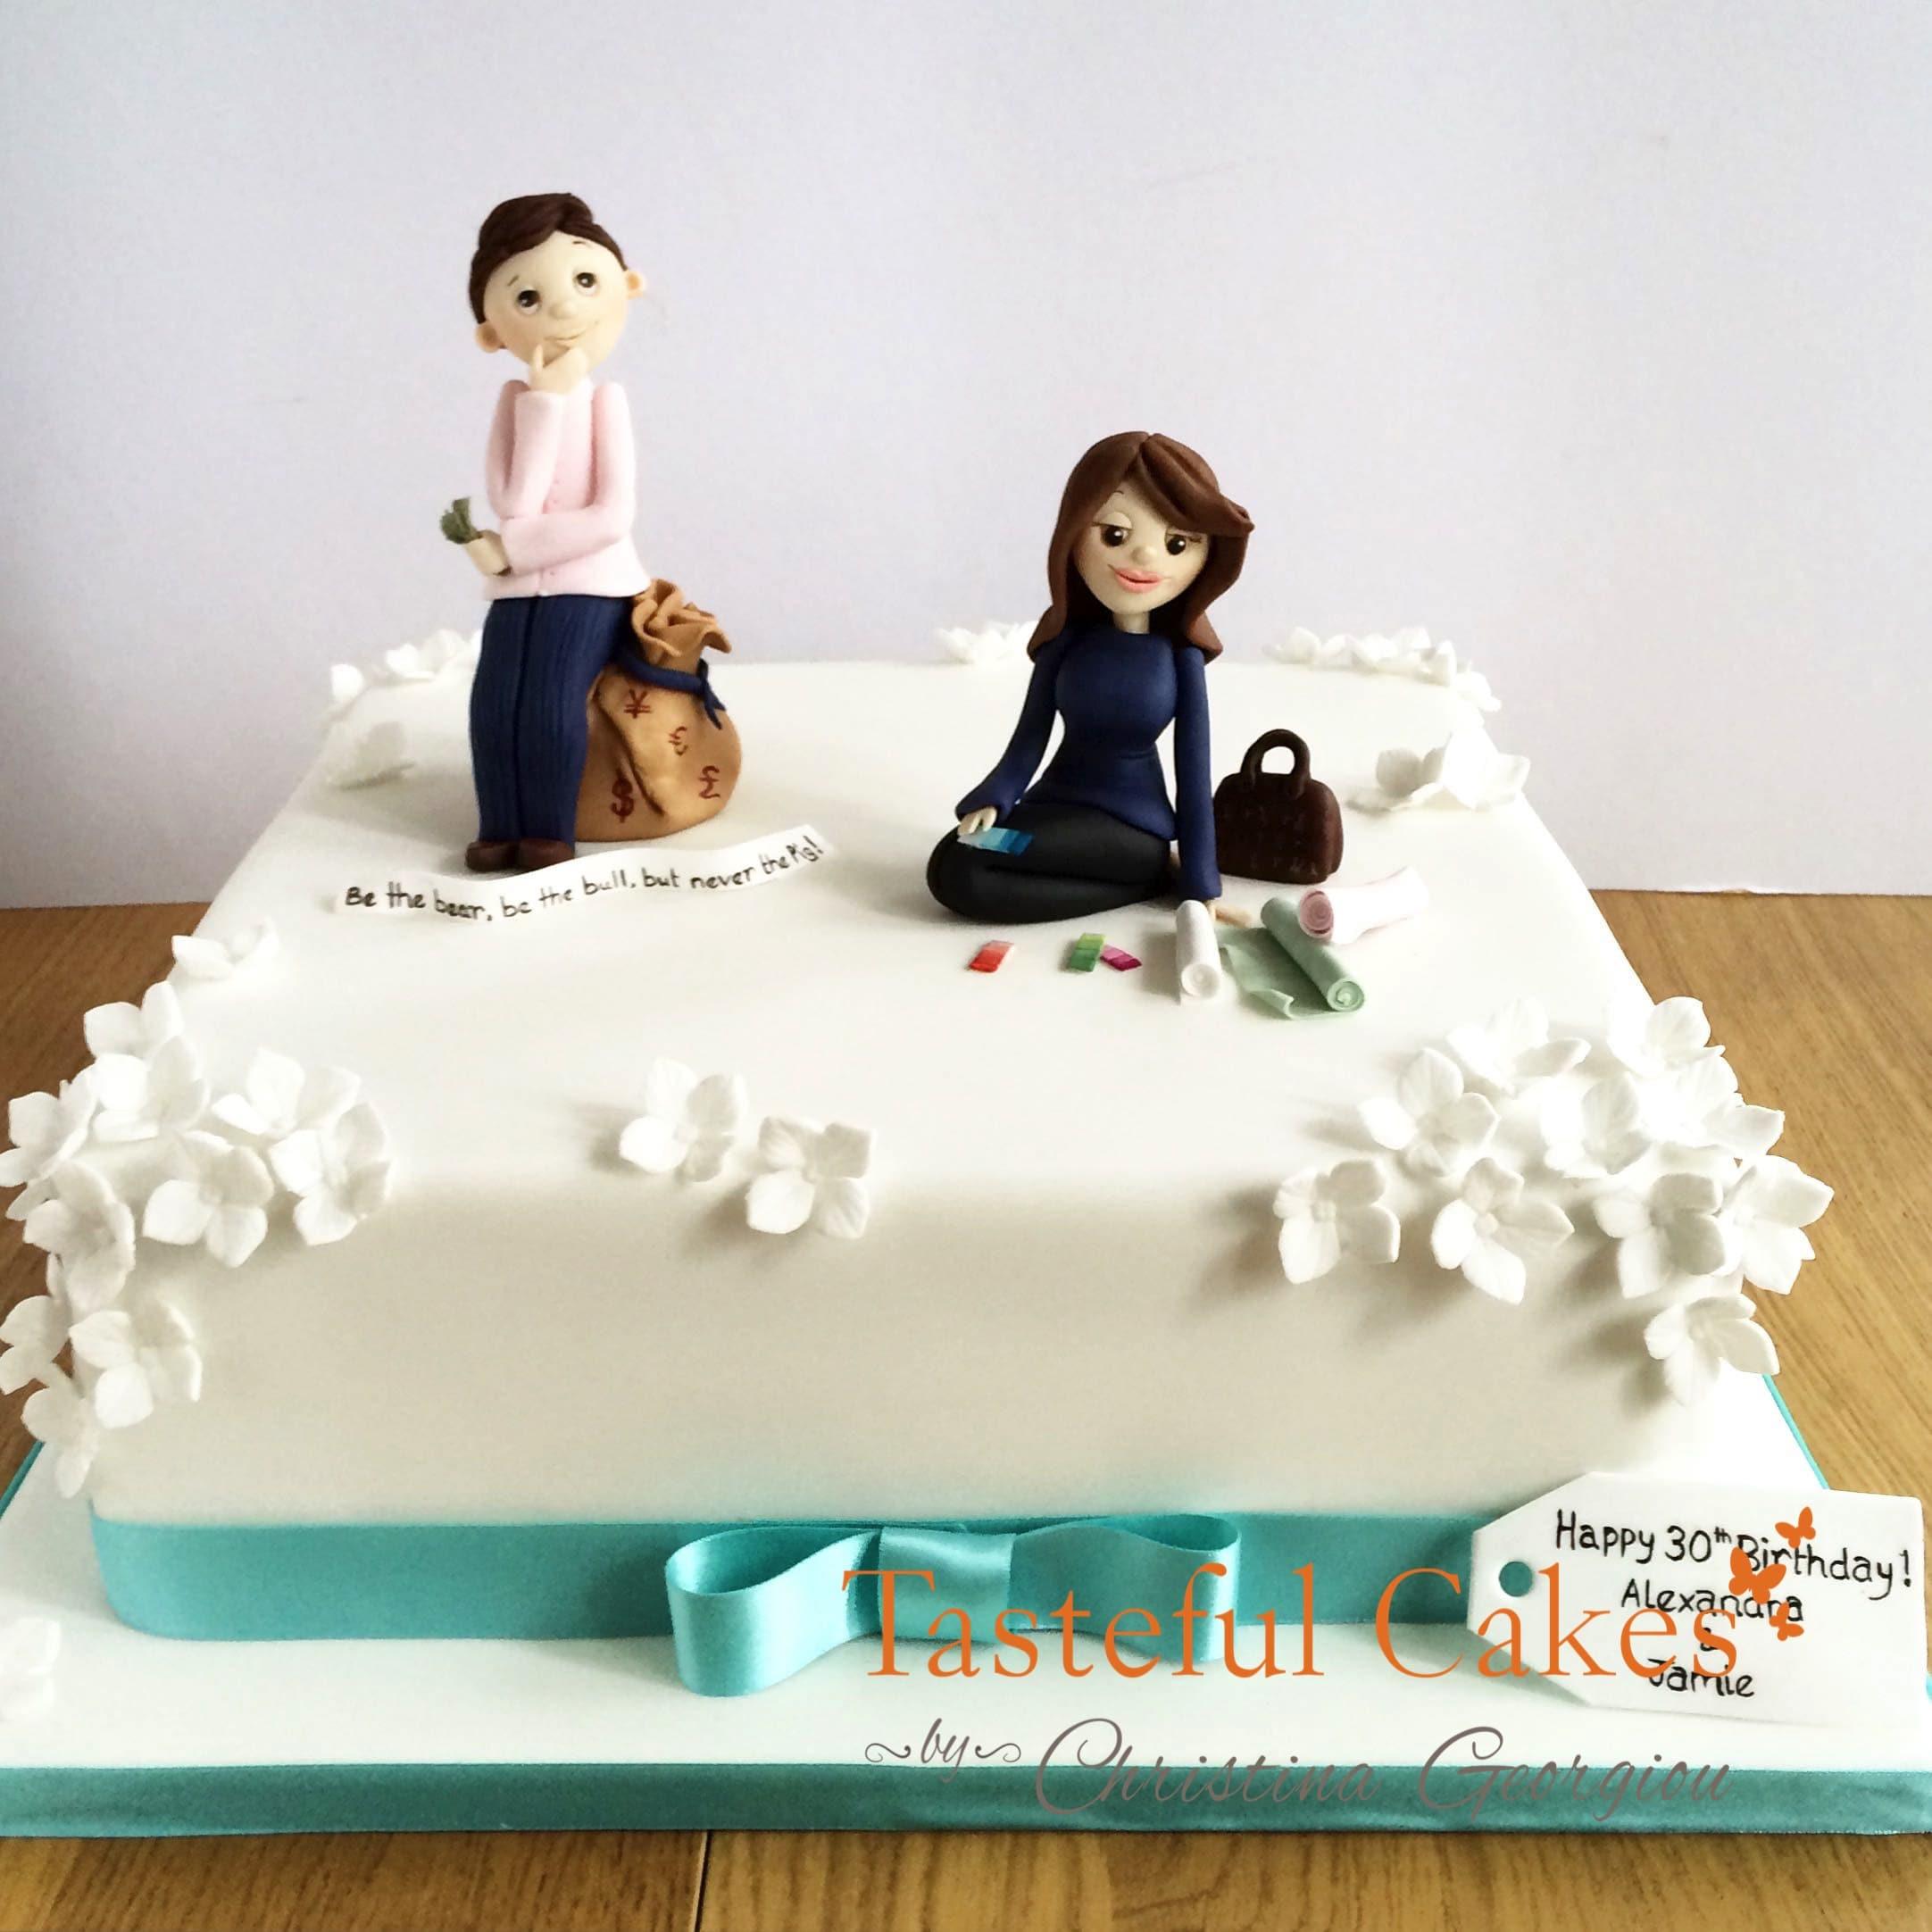 Tasteful Cakes By Christina Georgiou 30th Birthday Cake With